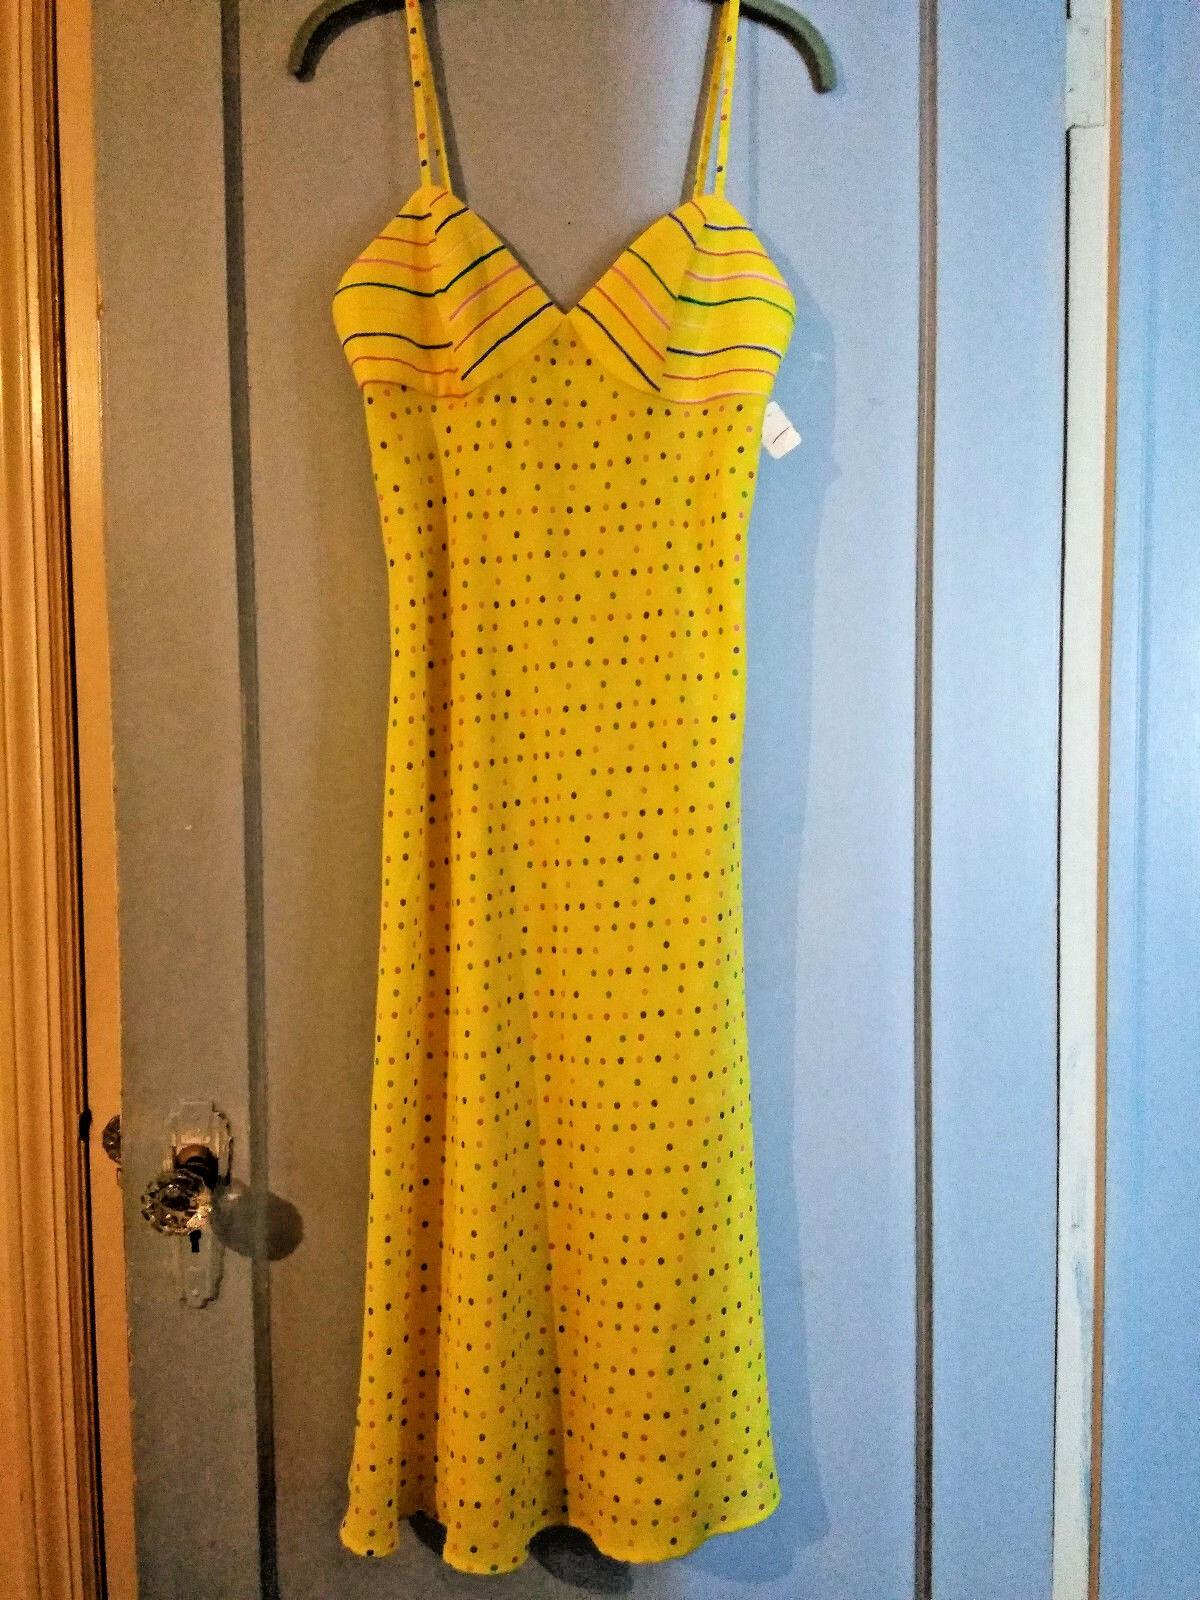 Vintage JUDY HORNBY Polka Dot & Stripes Yellow Dress NWT